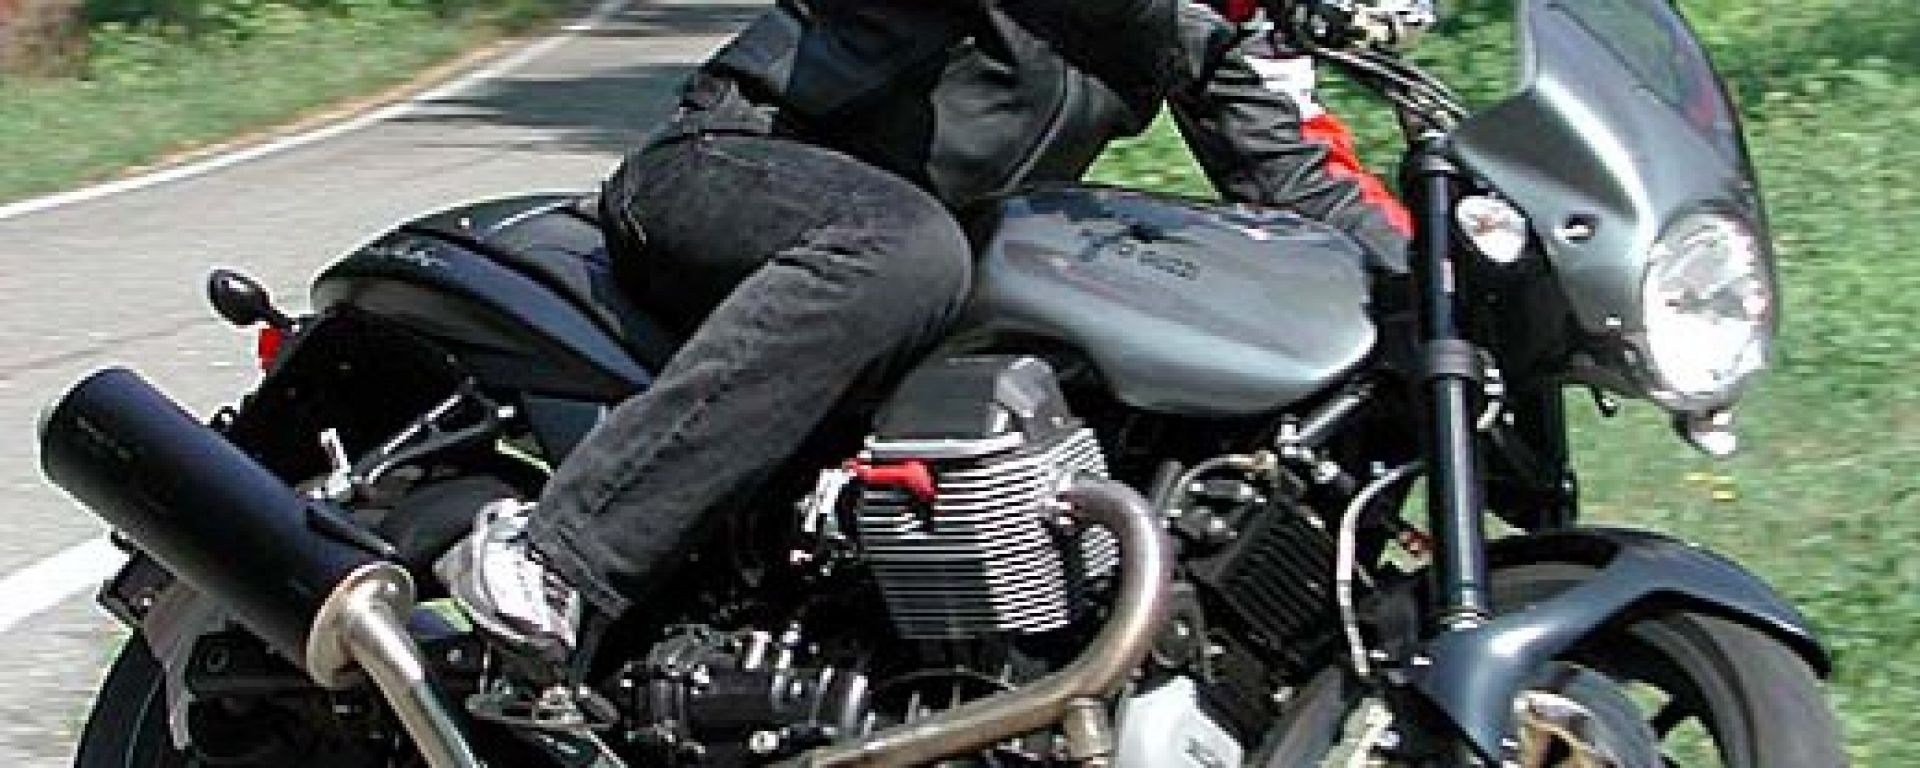 Day by Day Moto Guzzi Ballabio